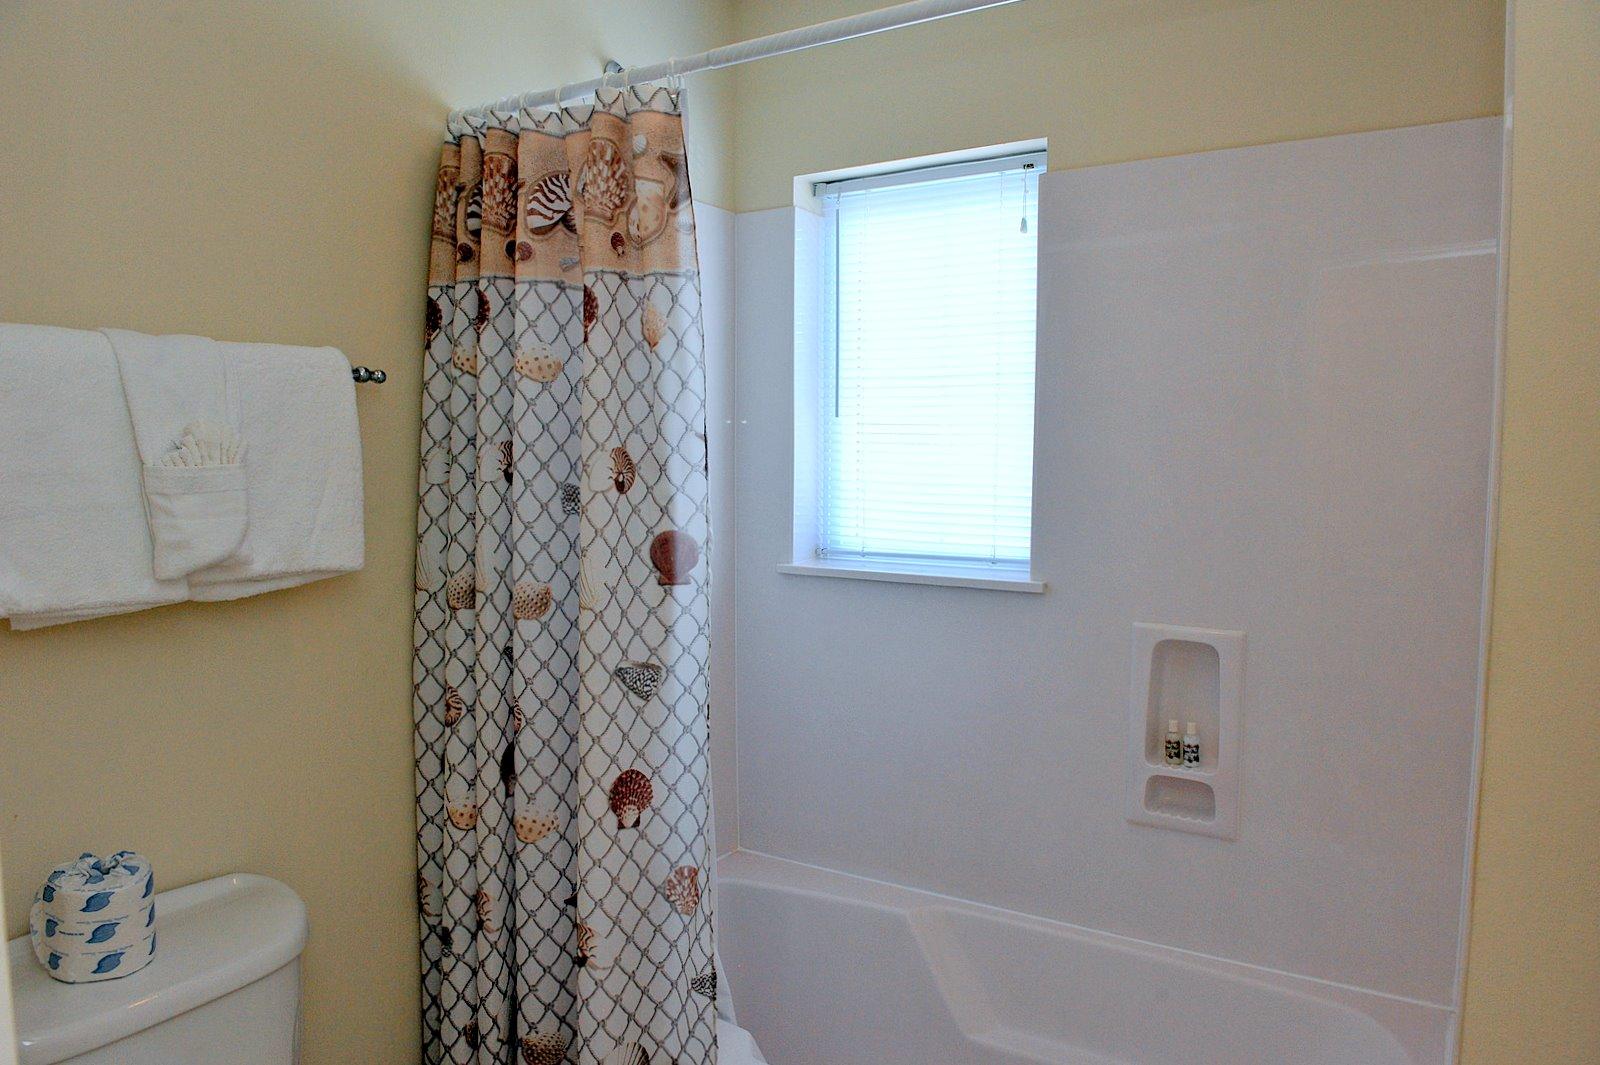 1280 Laurel Grove Condo rental in Sandestin Rentals ~ Cottages and Villas  in Destin Florida - #17